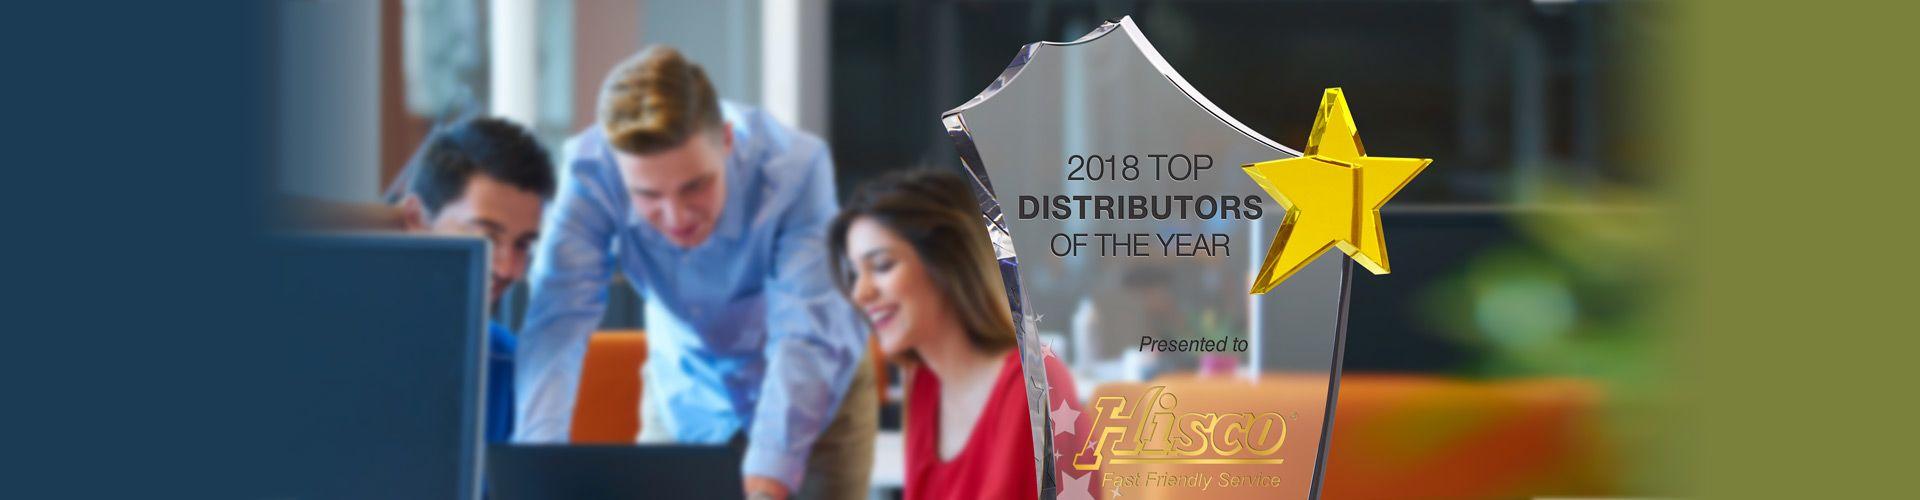 Custom Crystal Top Distributors, Dealers, Vendors Awards - Banner 1